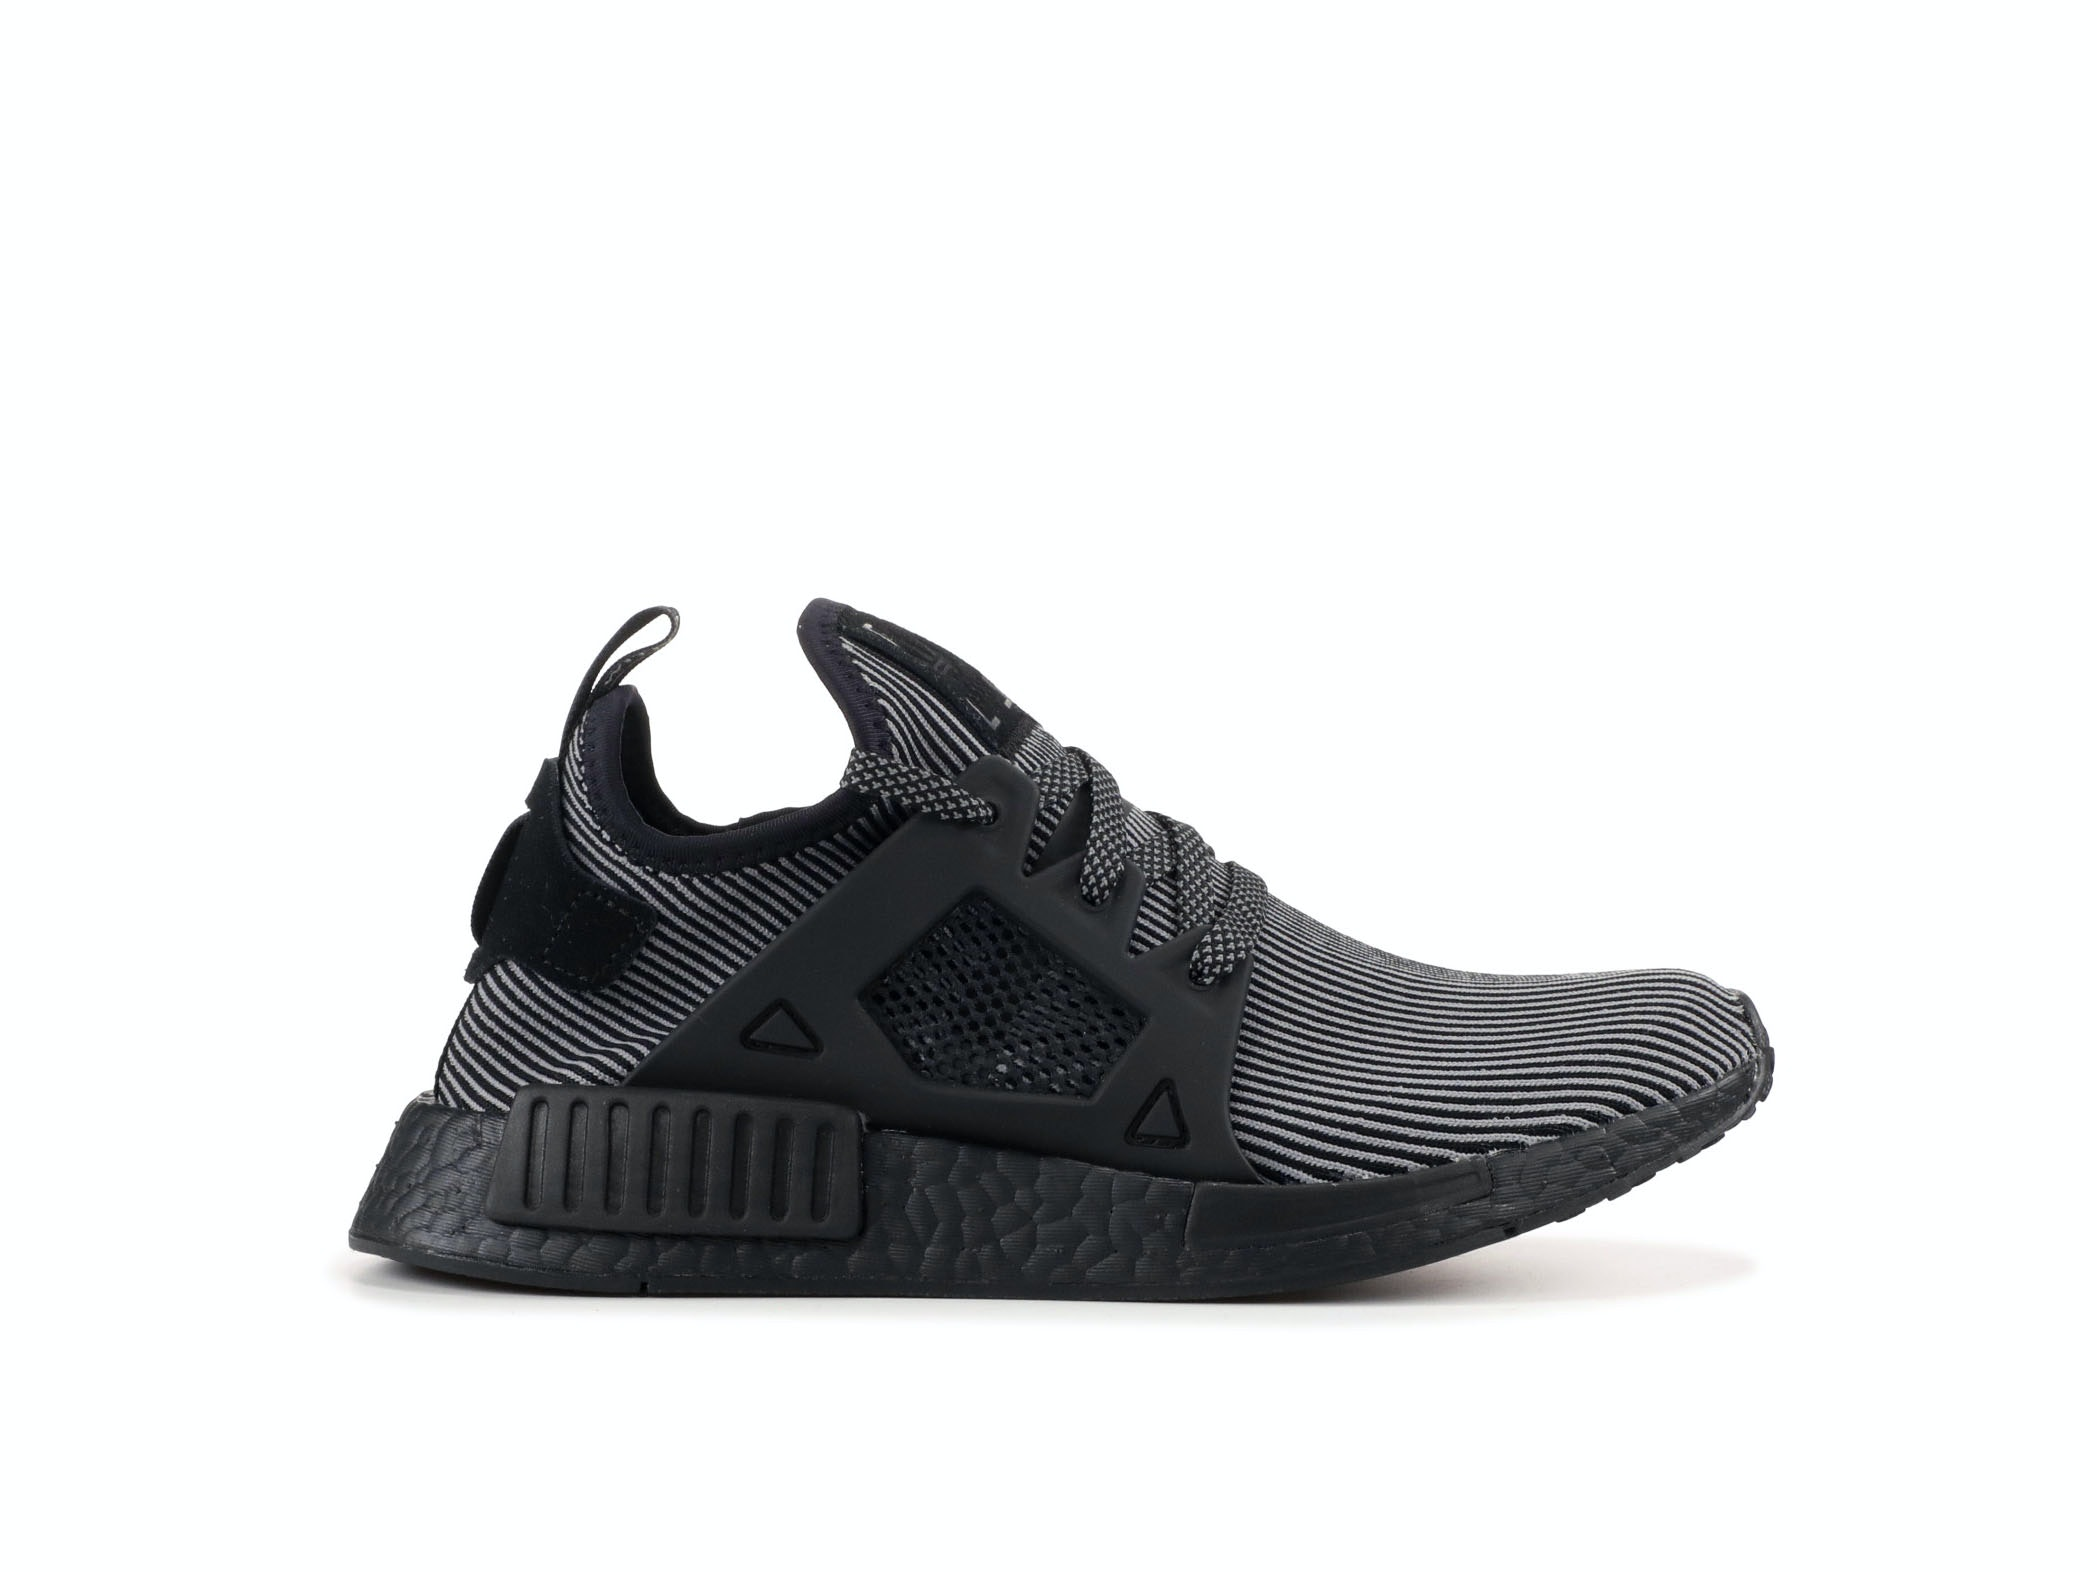 443ca56d0bbd2 Shop Black Boost NMD XR1 Online